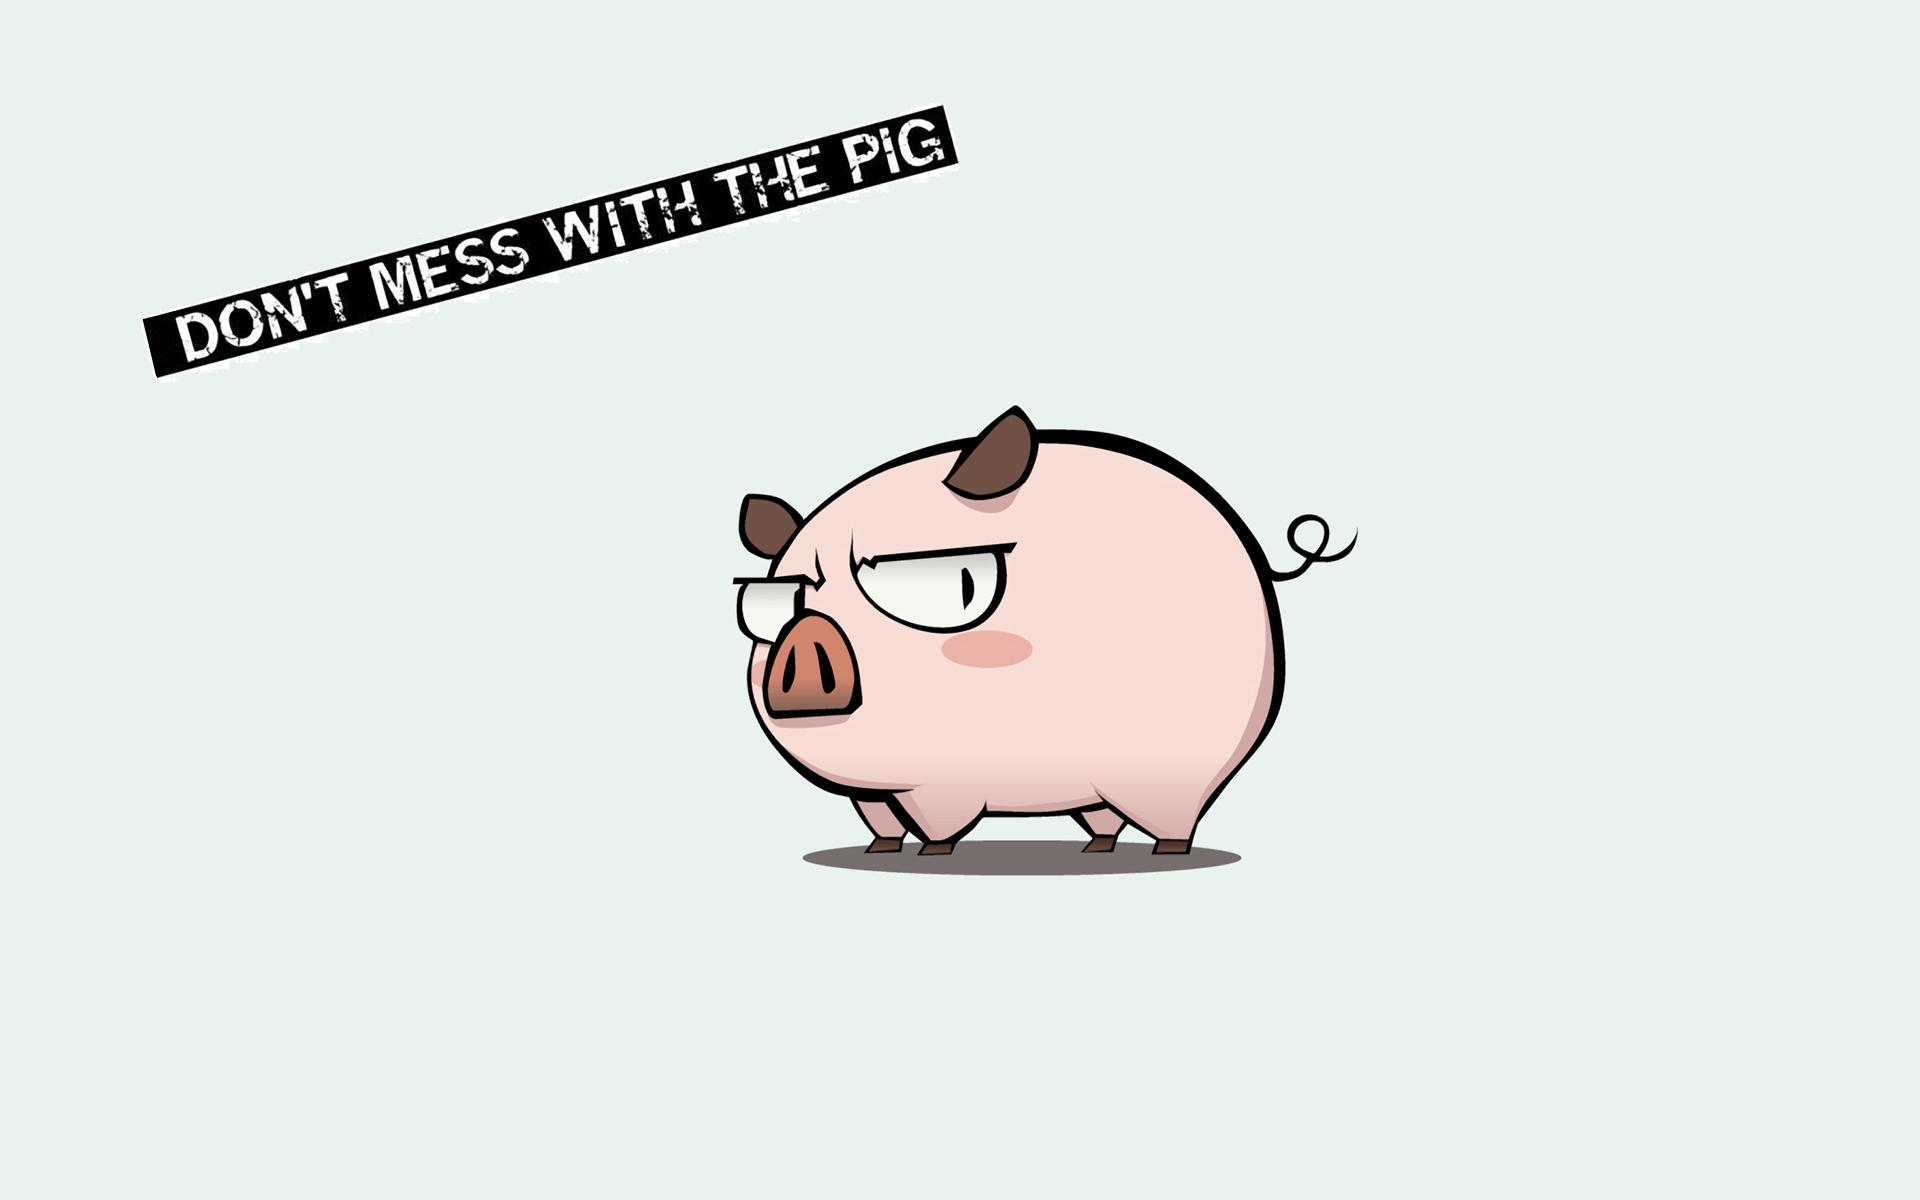 cute pigs cartoon wallpaper - photo #2